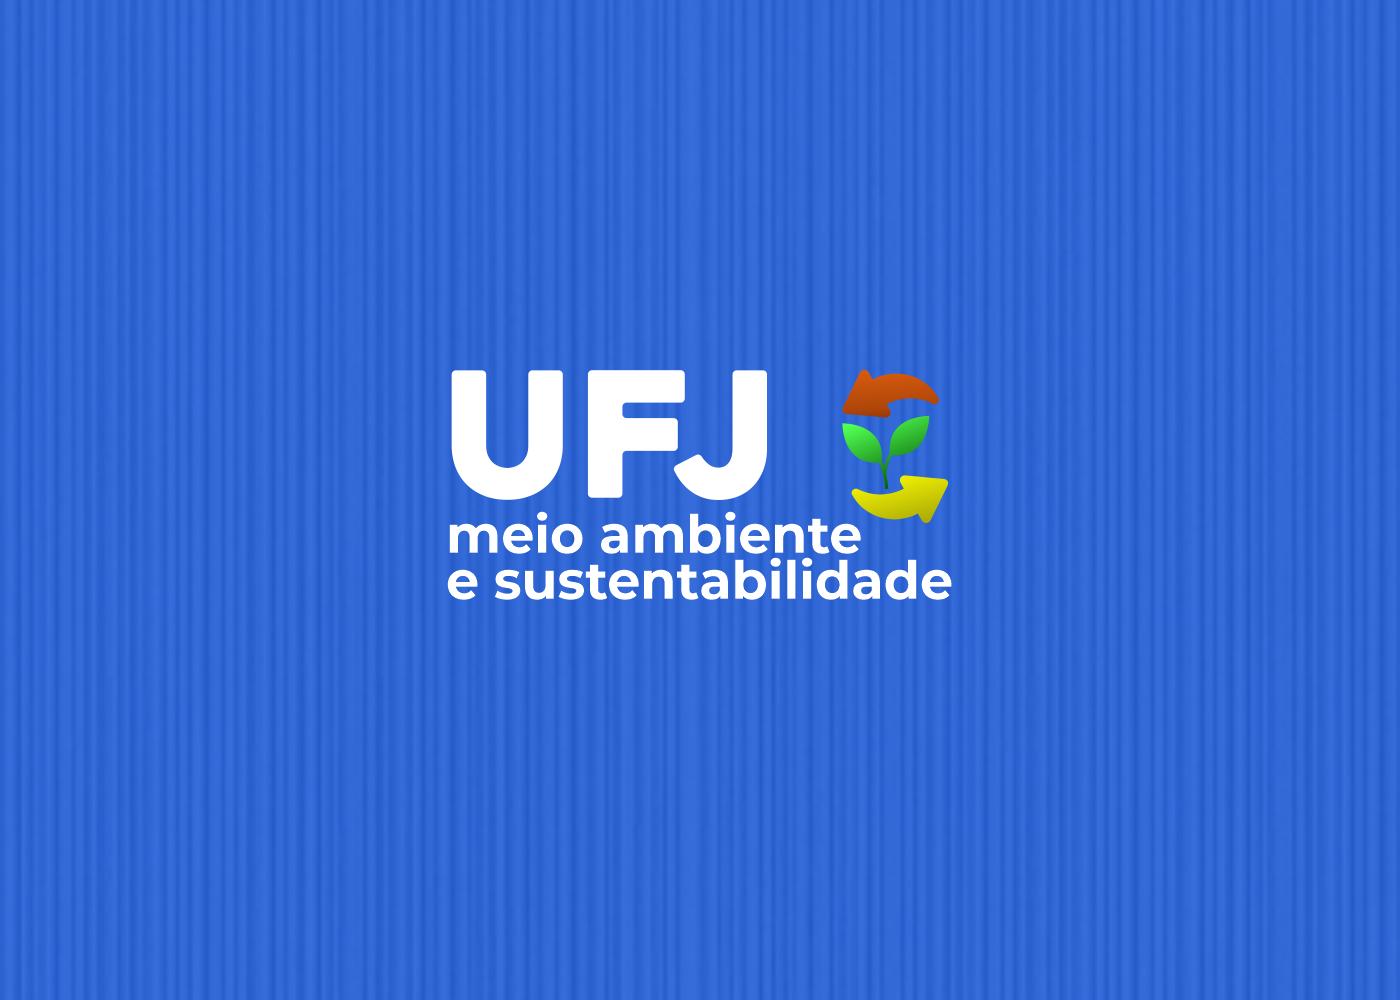 Logotipo UFJ meio ambiente e sustentabilidade